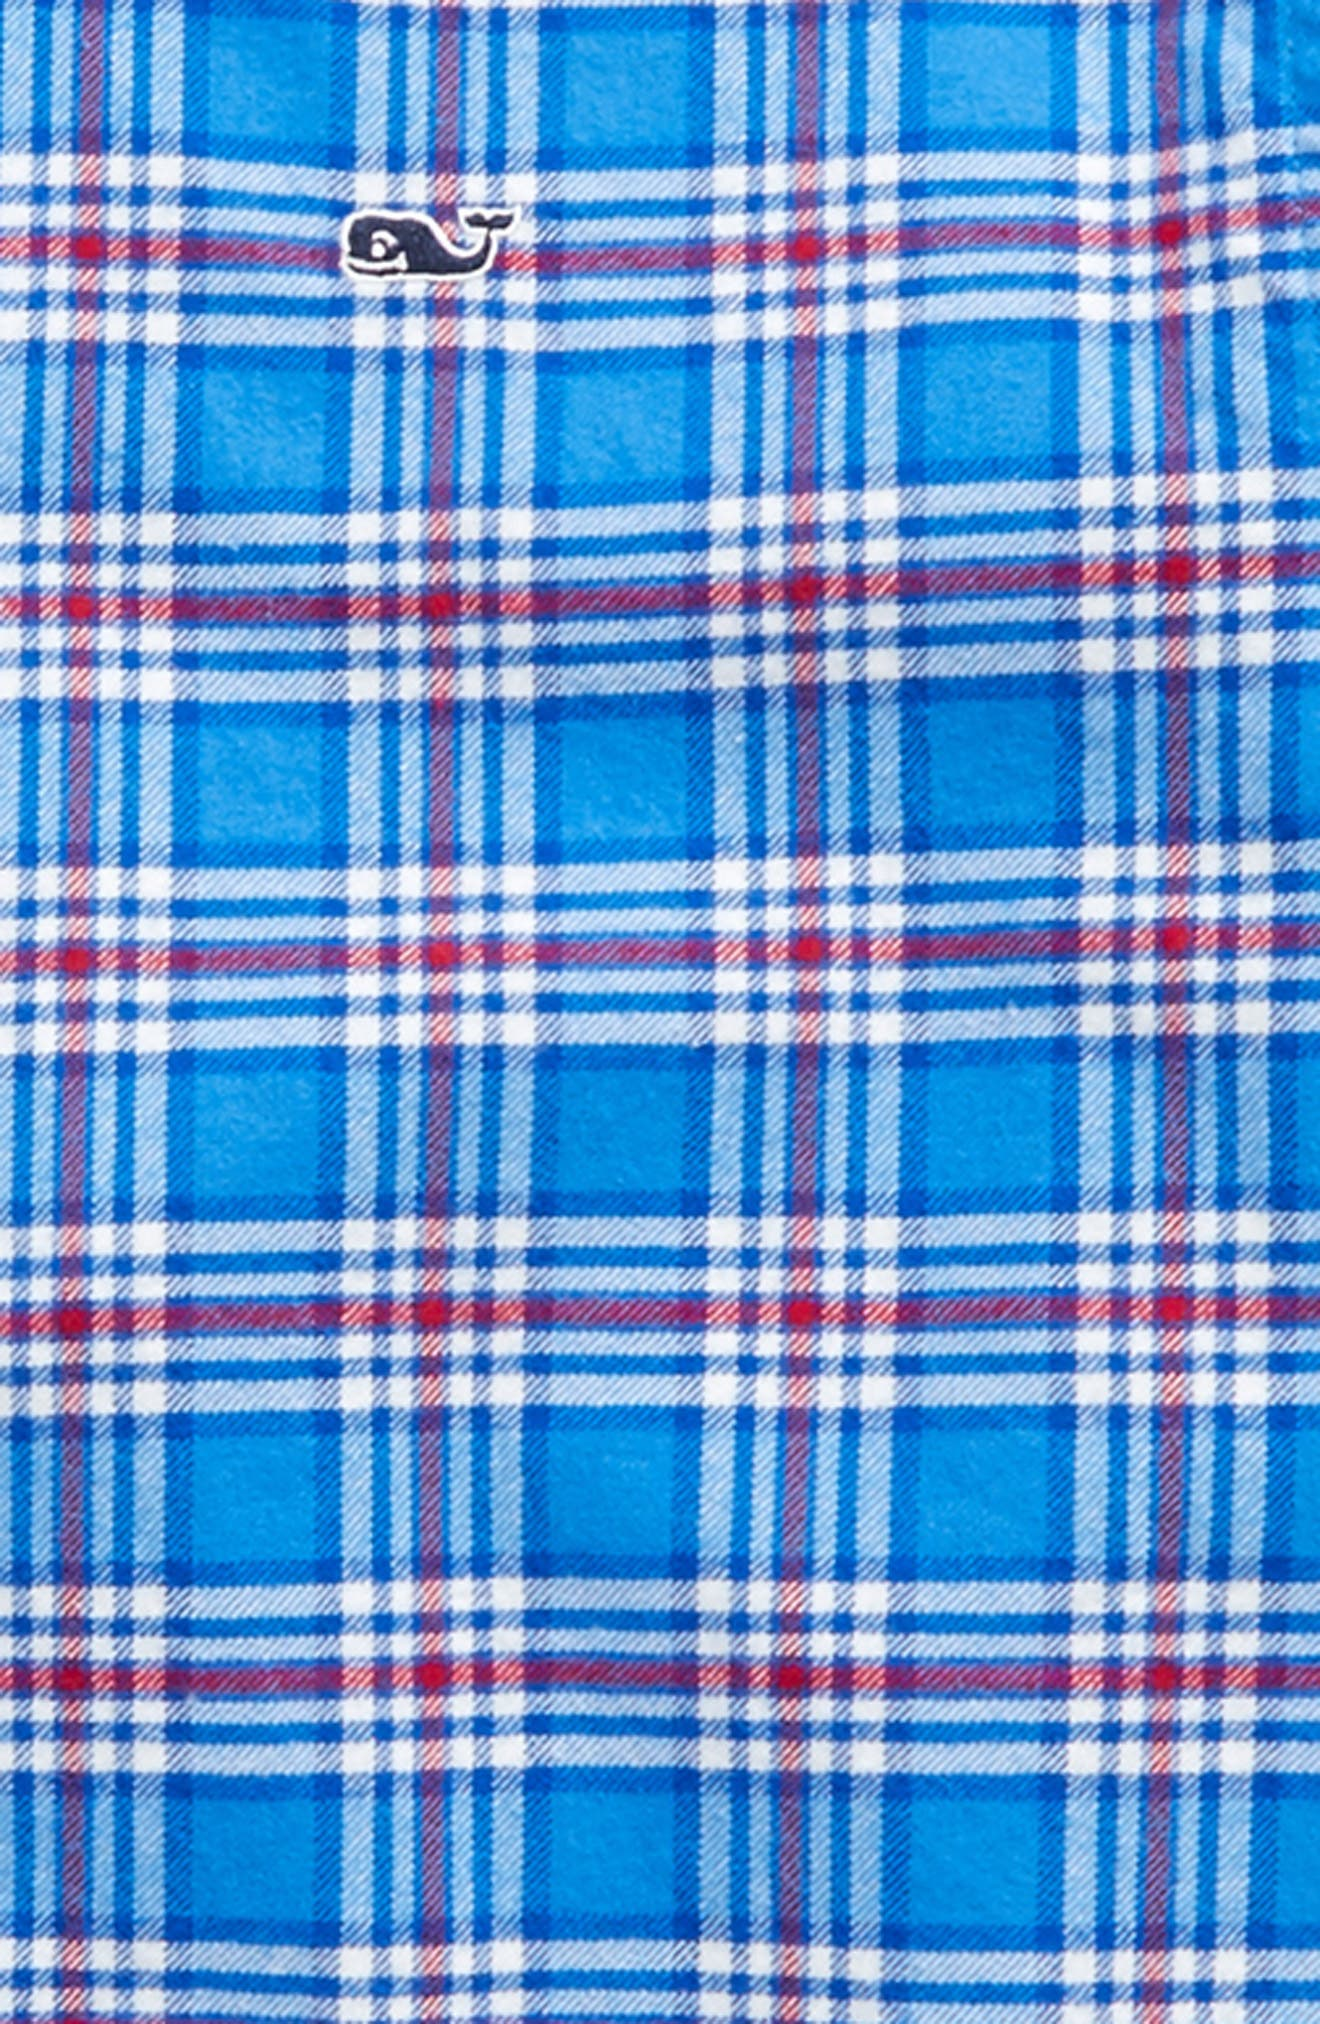 Chandler Pond Plaid Flannel Shirt,                             Alternate thumbnail 2, color,                             400